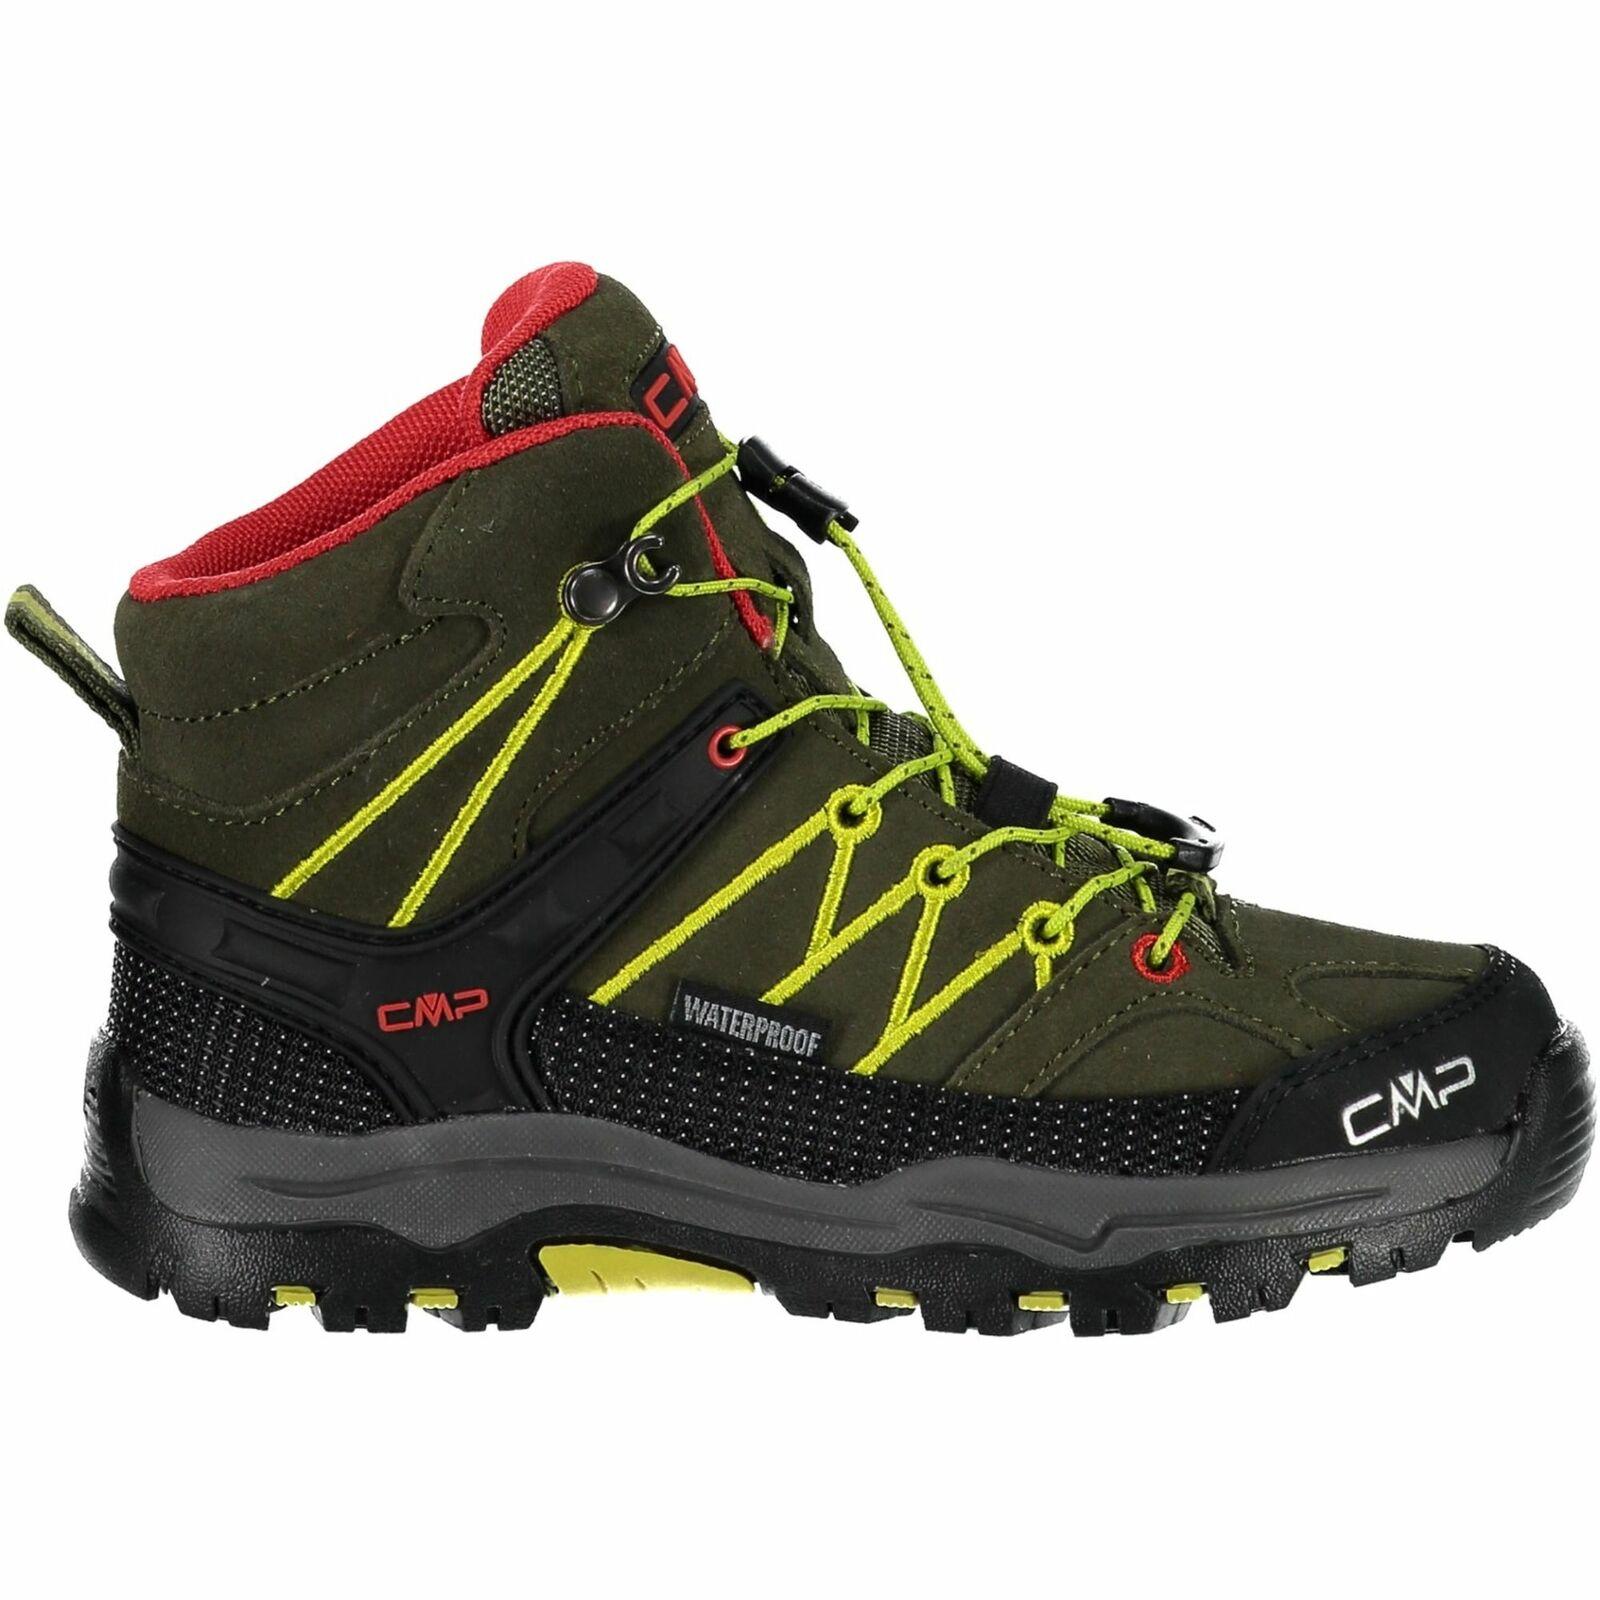 CMP trekking zapatos  Al aire libreschuh Kids Rigel mid trekking zapatos WP verde claro  auténtico